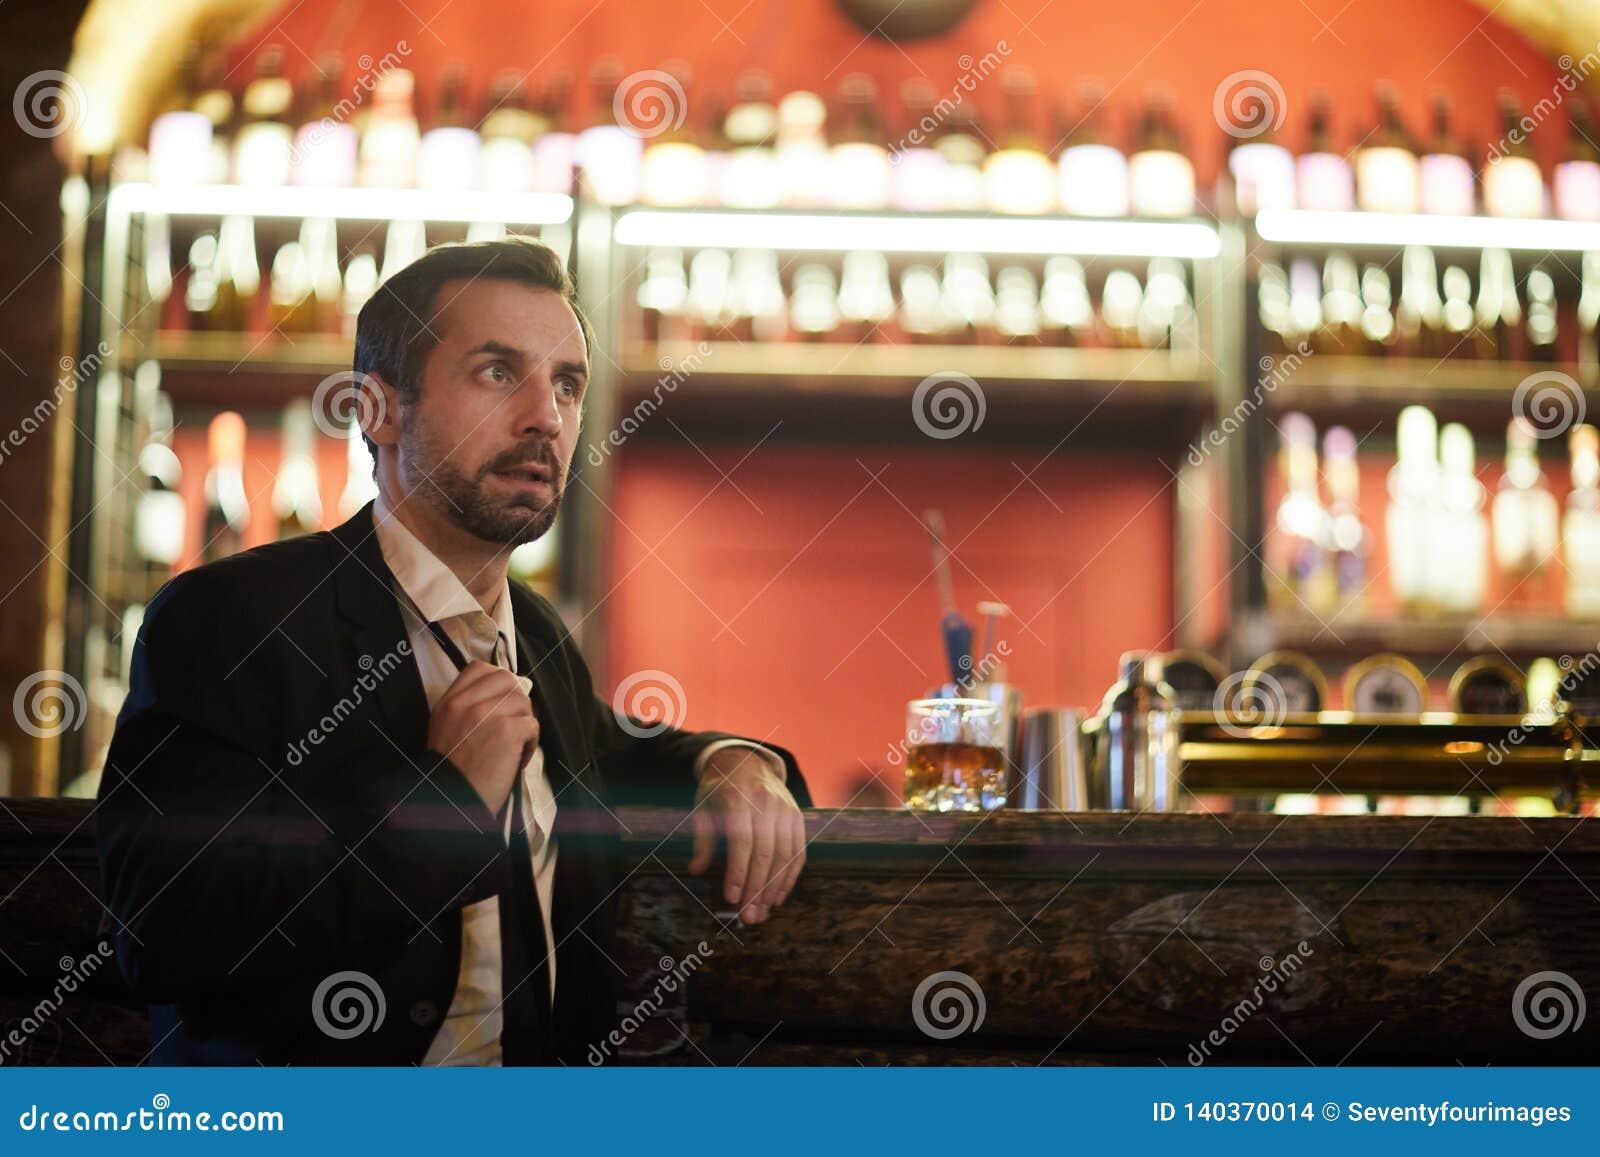 Hombre de negocios Waiting en barra